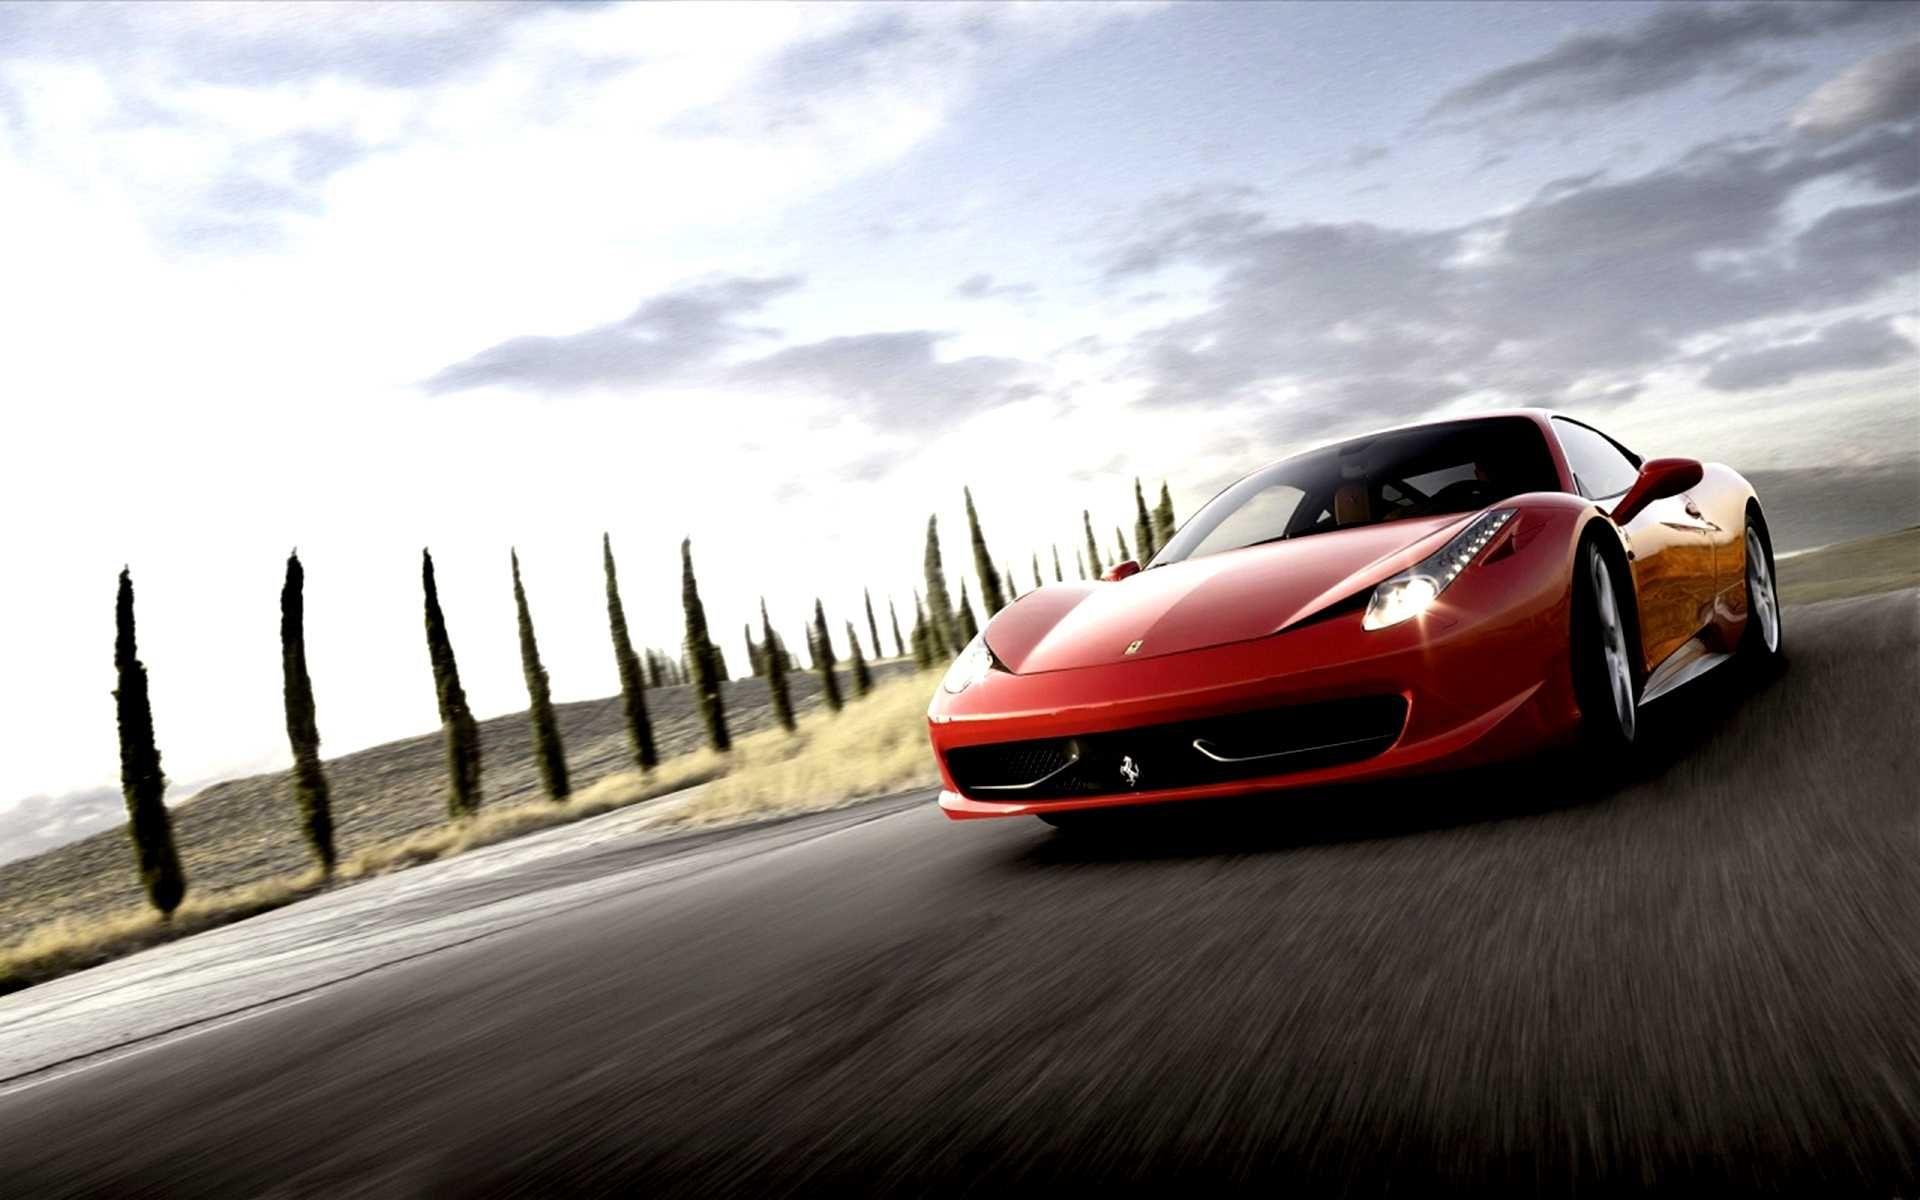 Ferrari 458 Italia Supercar Hd Wallpaper Cool Cars